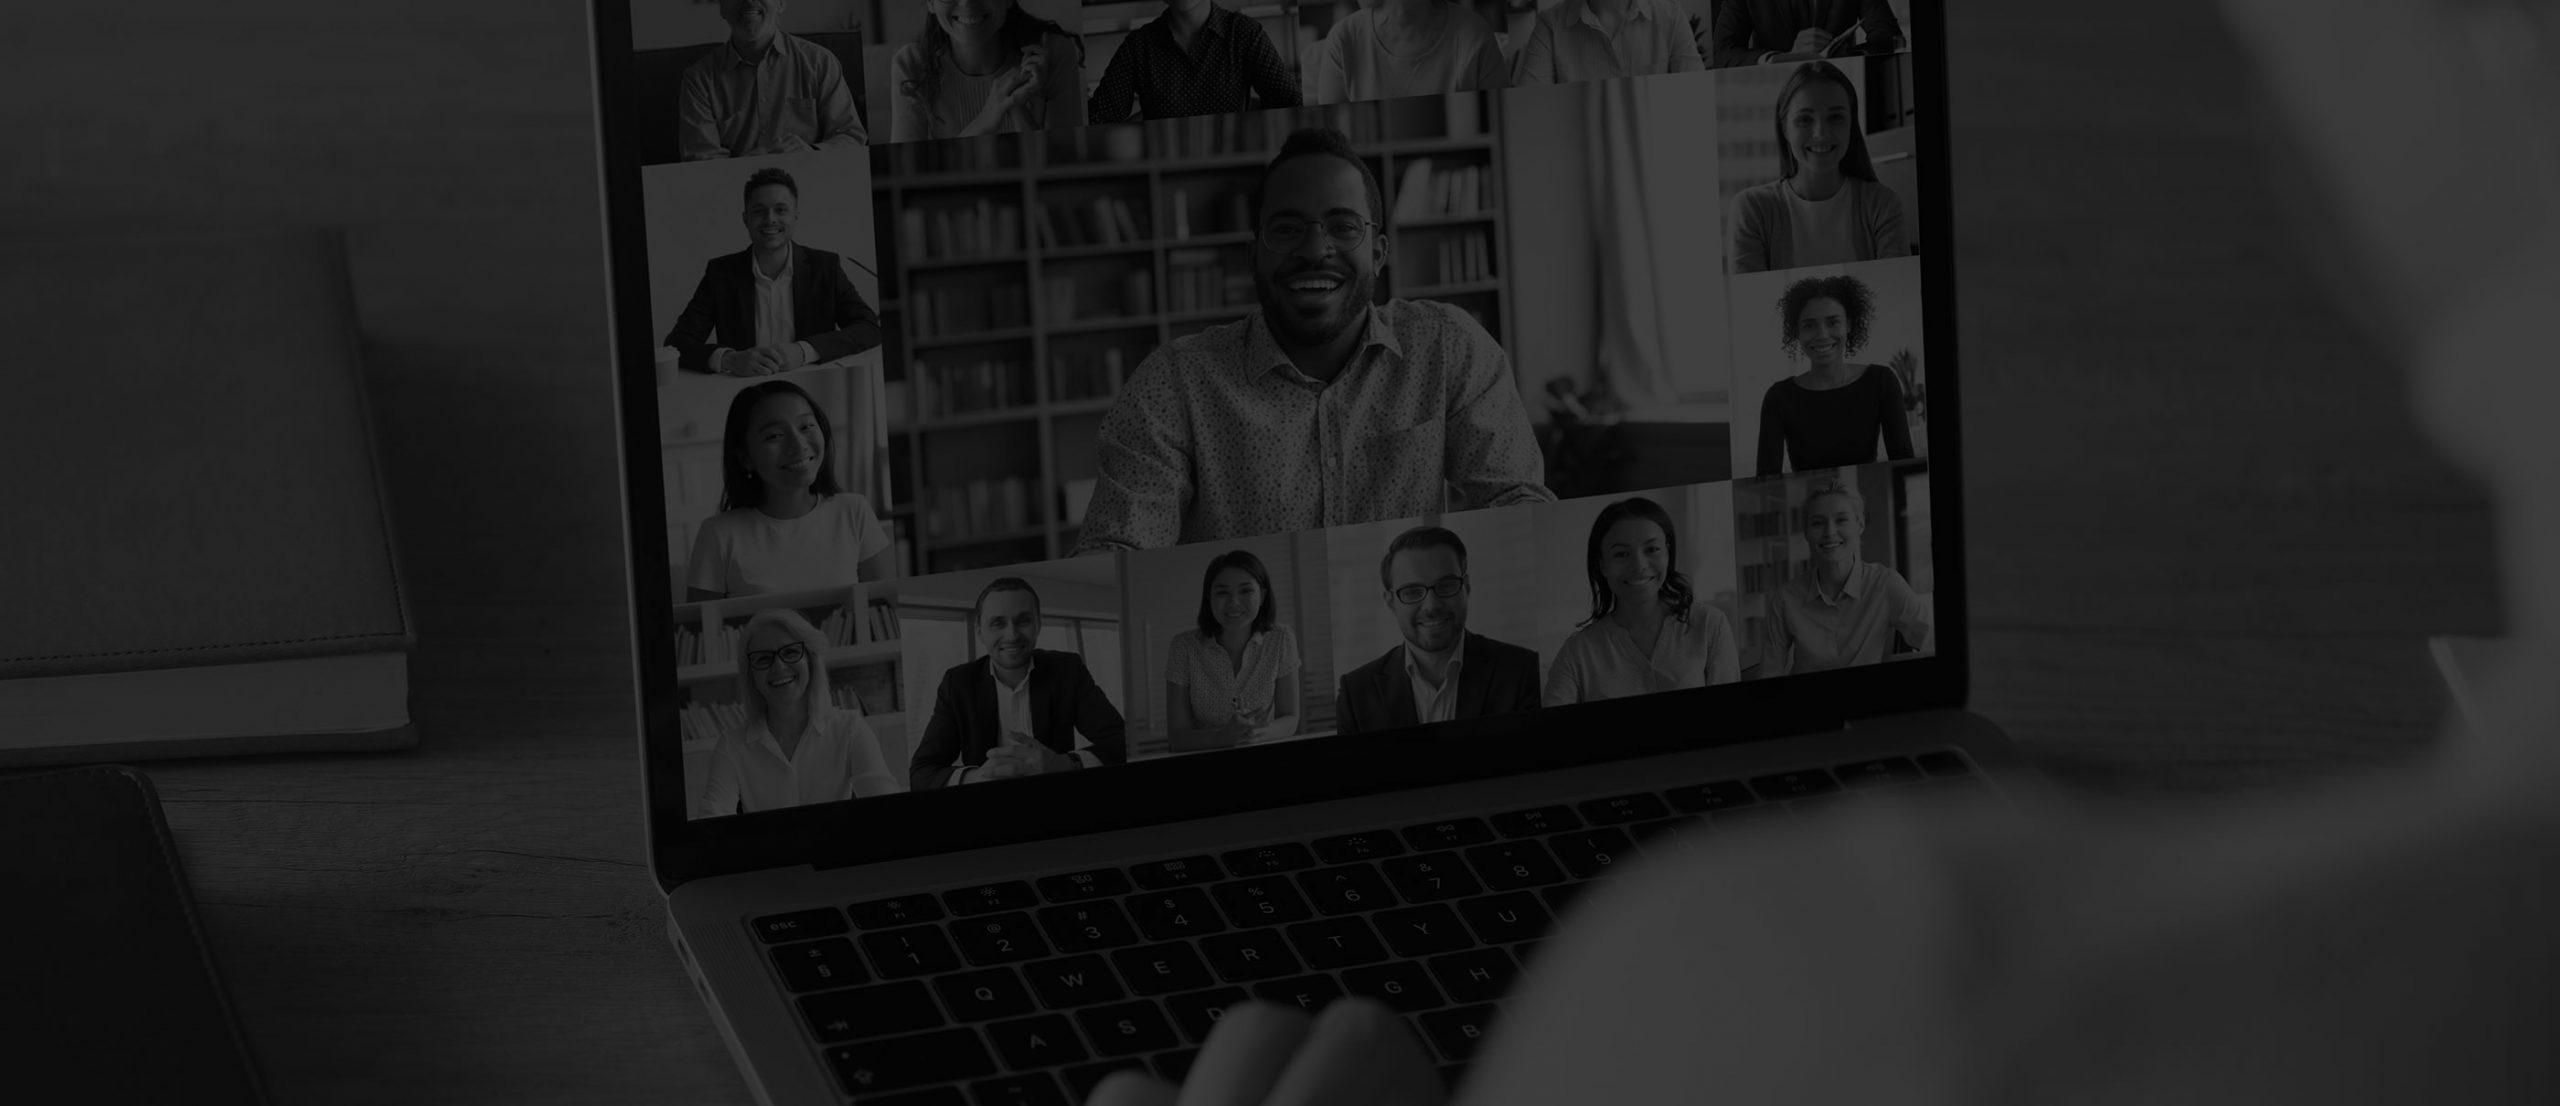 Kaleida: New Survey Reports Heavy Business Modernisation Through Digital Banner